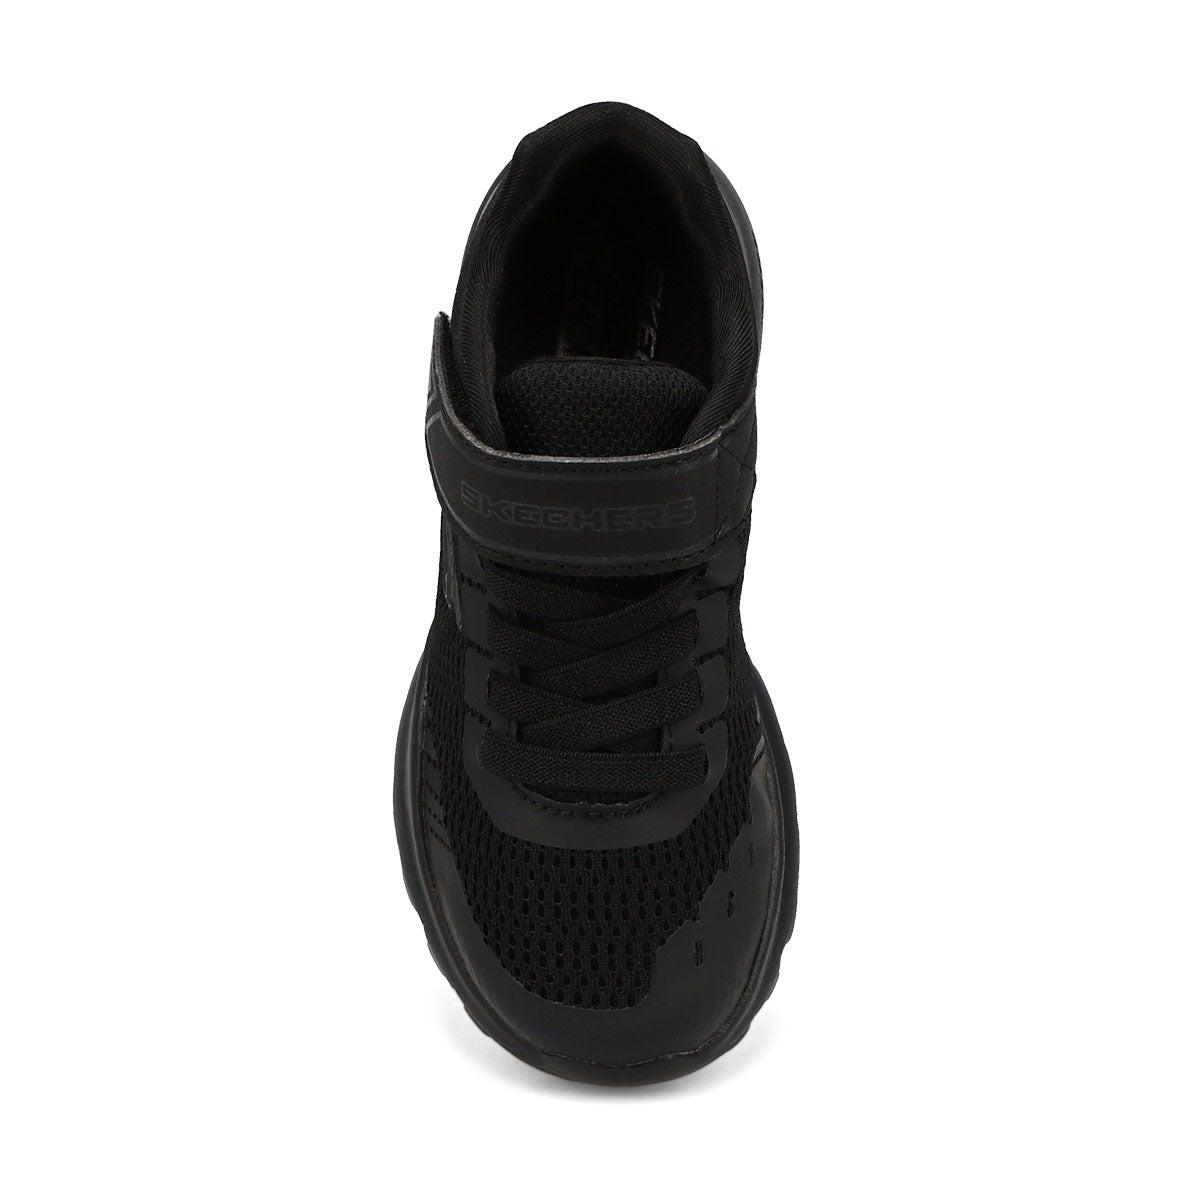 Boys' Razor Flex Sneakers - Black/Black